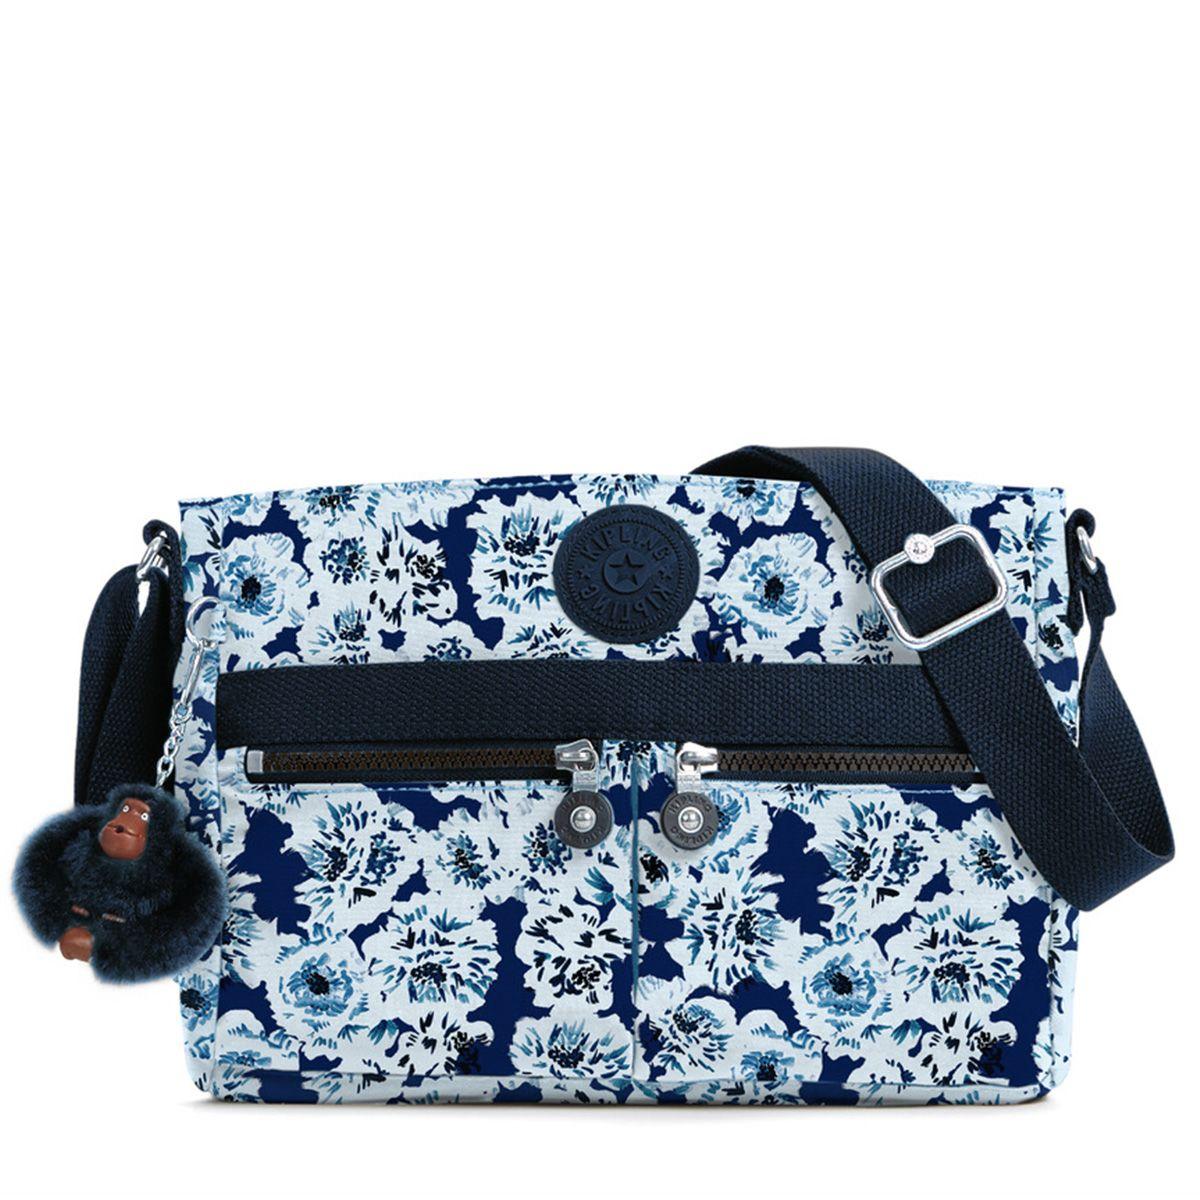 9828a80b4a Kipling Handbags